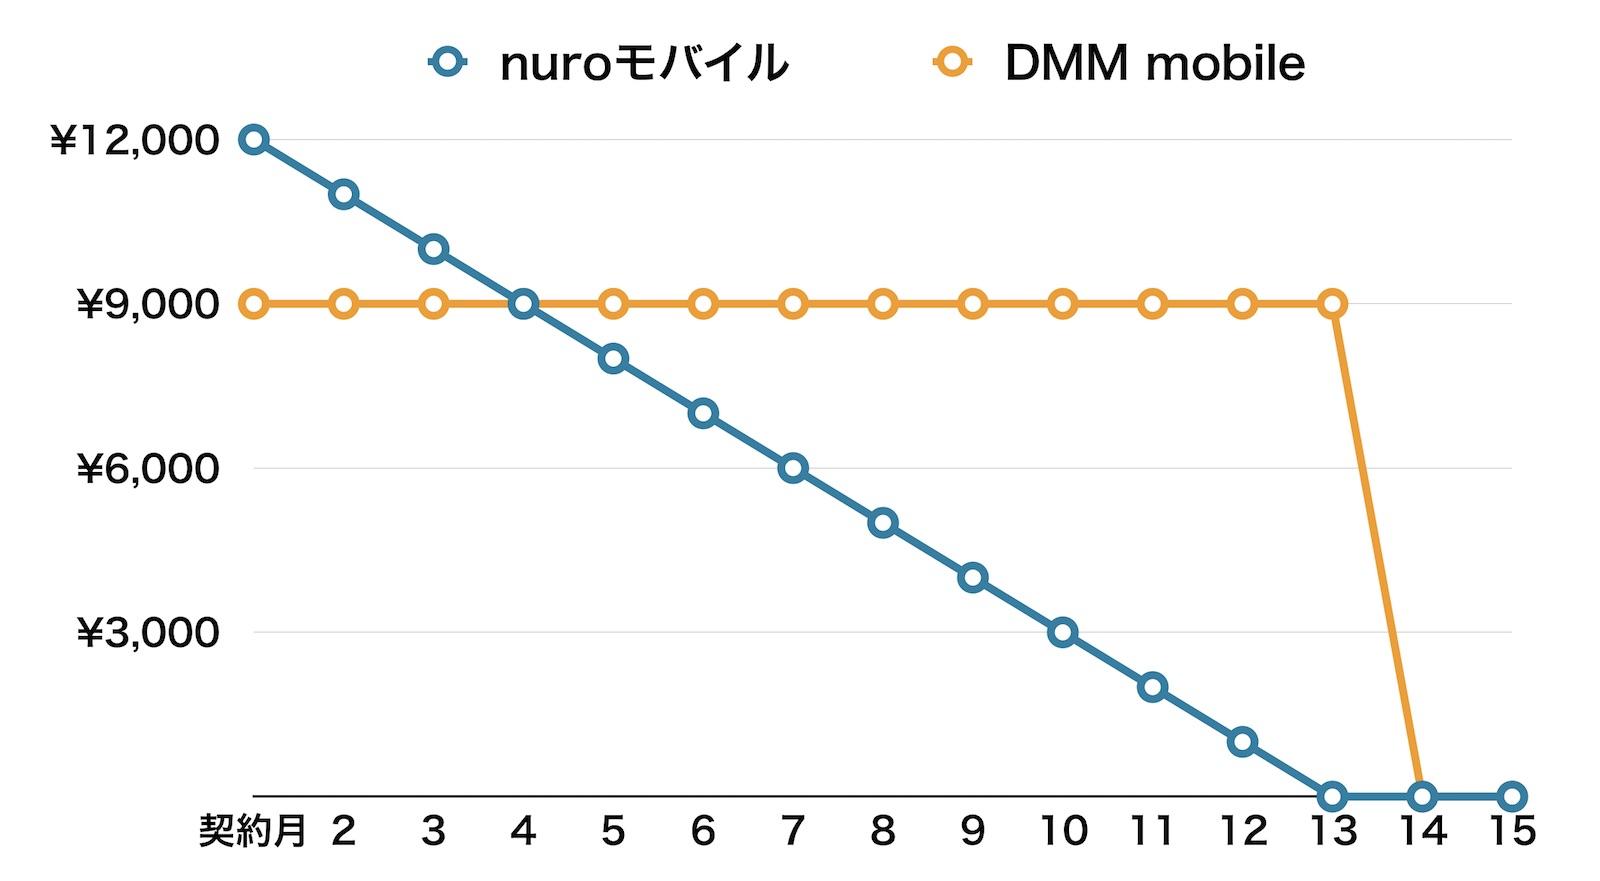 nuroモバイル DMM mobile 違約金 比較